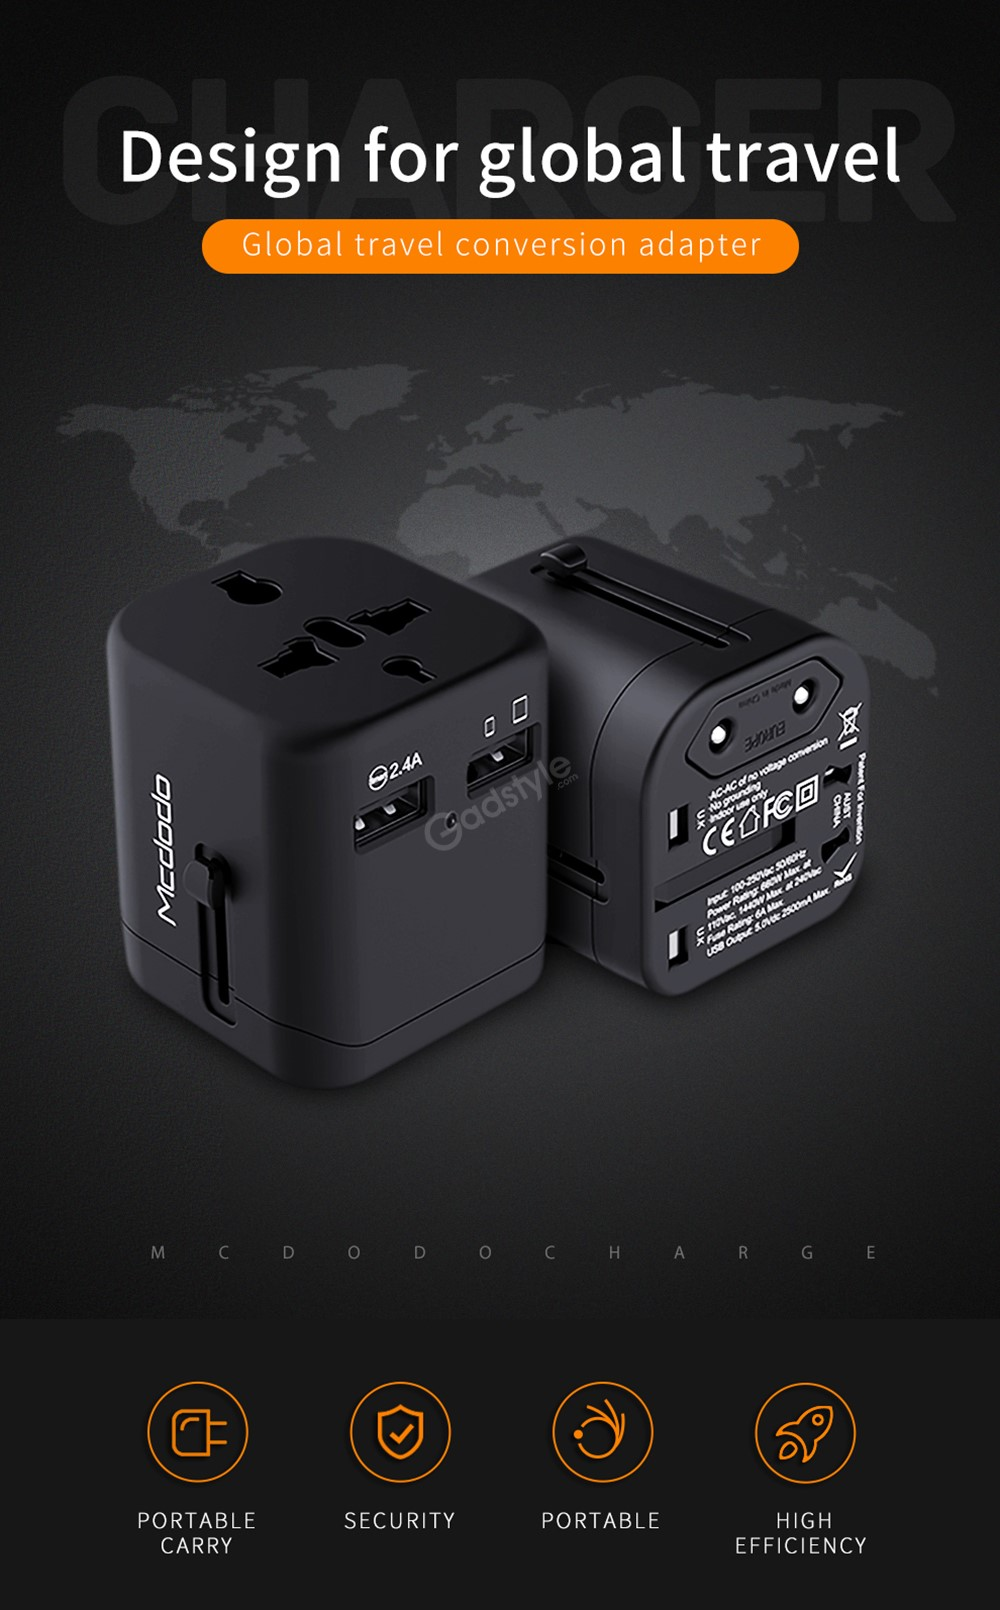 Mcdodo Cp 4380 International Travel Power (2)